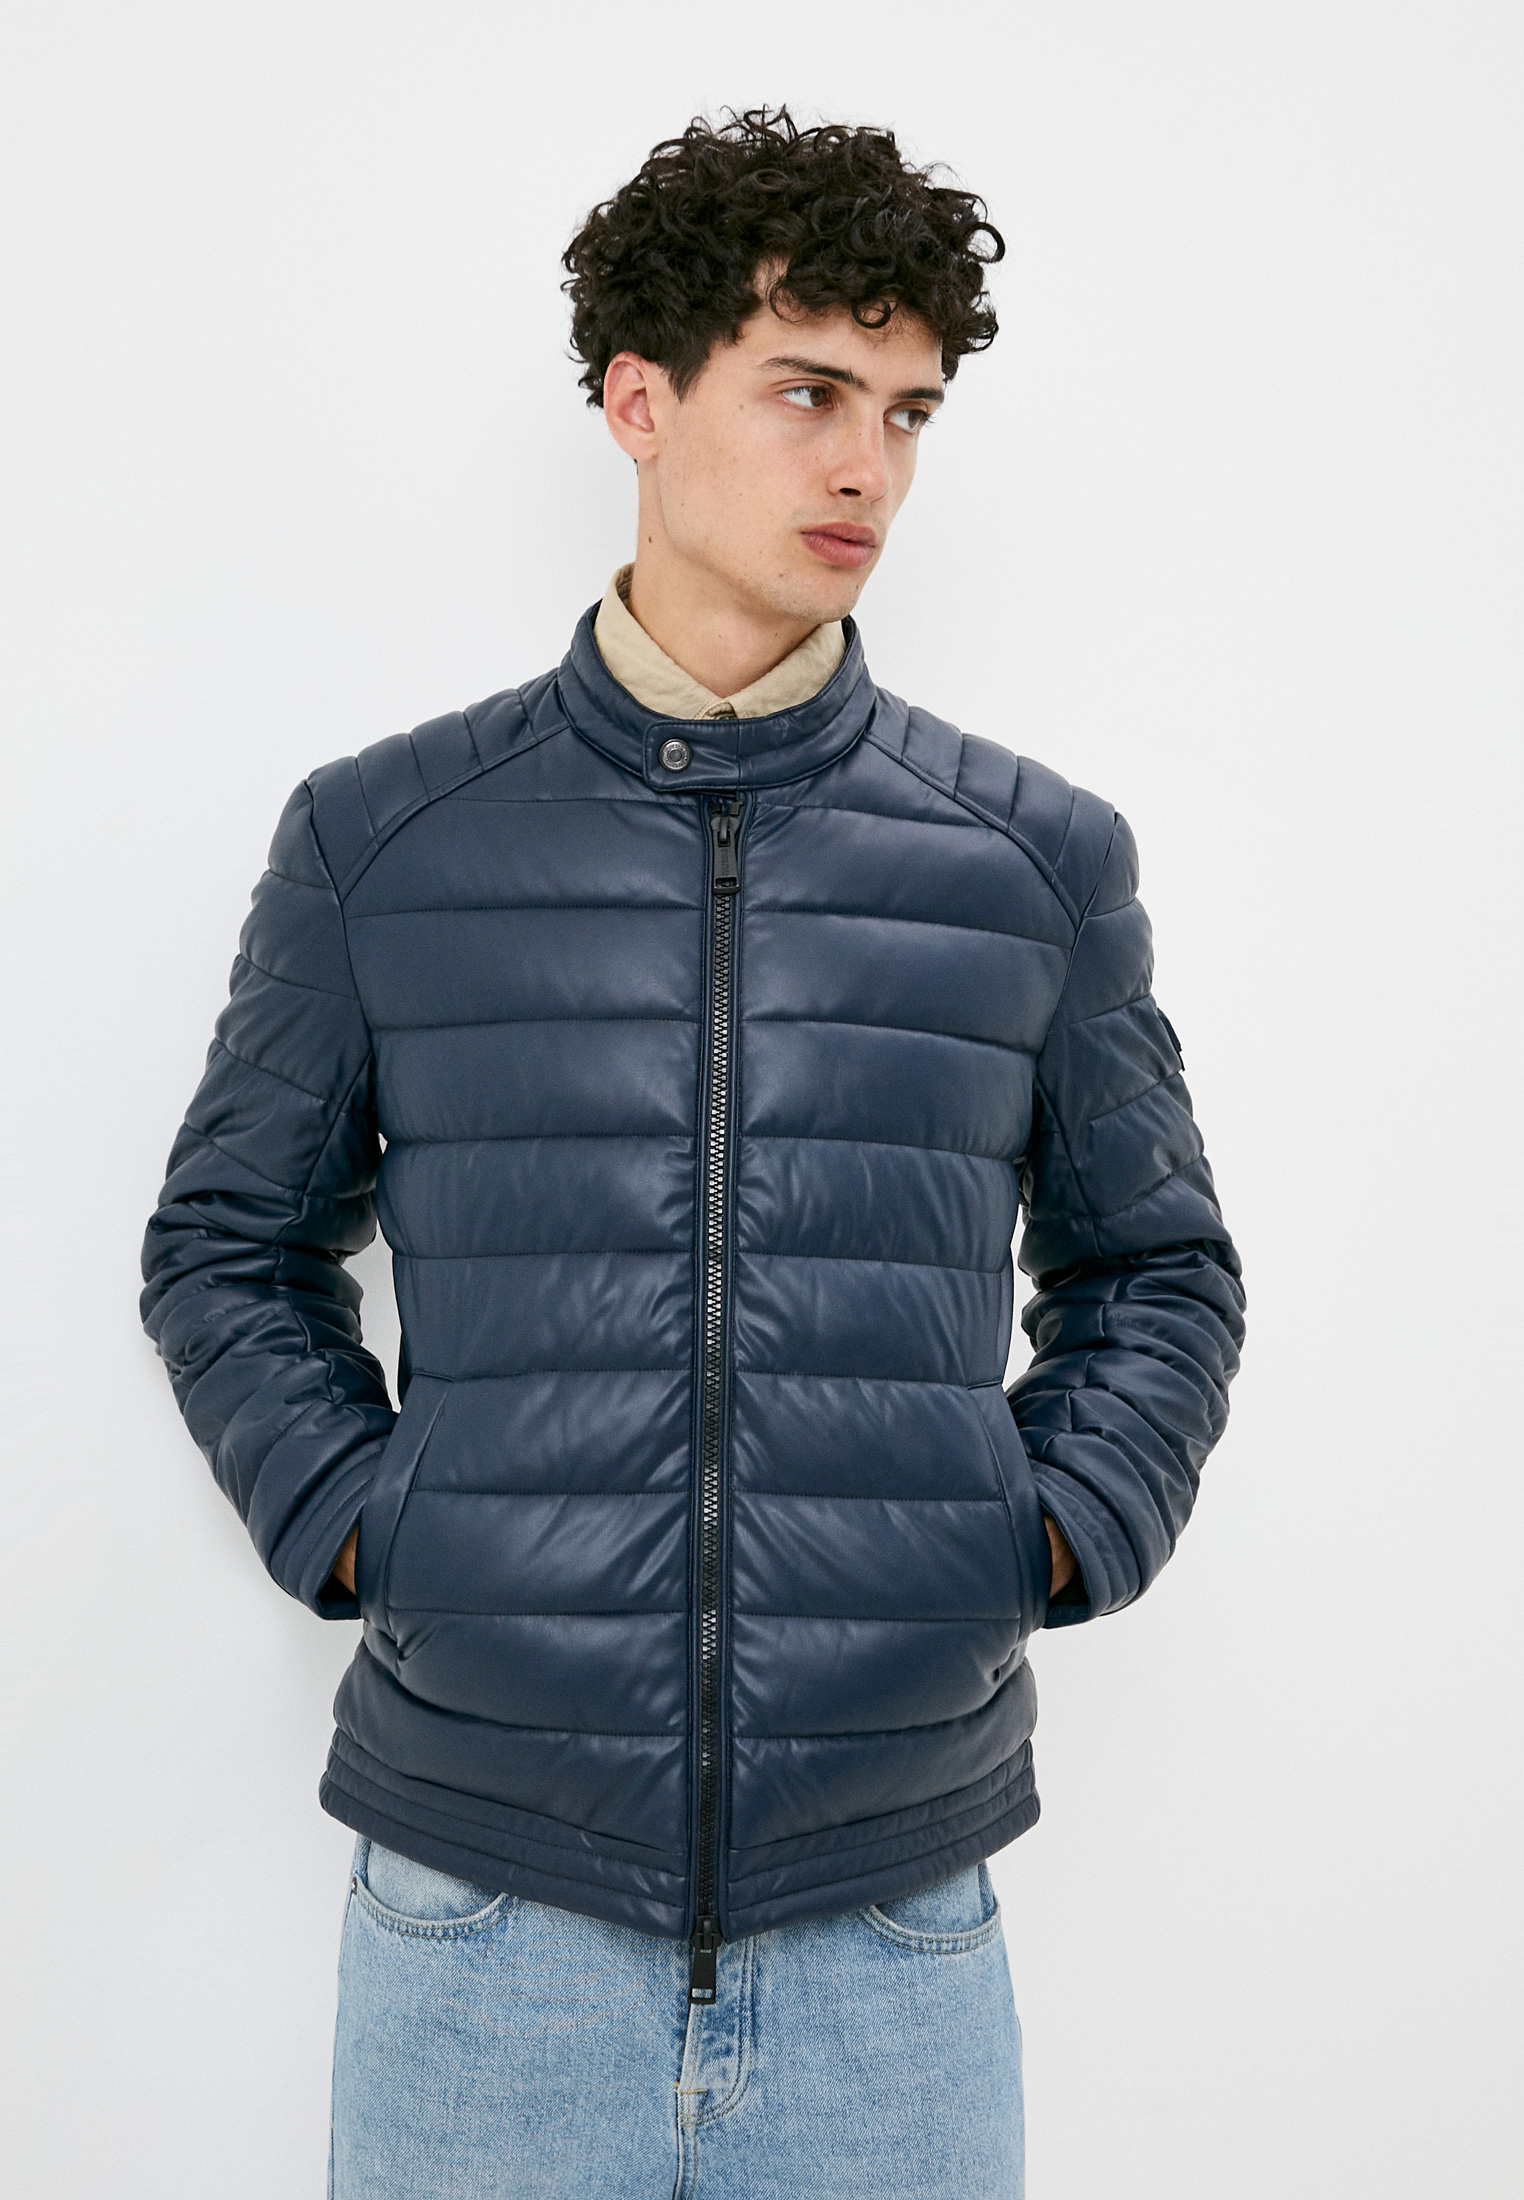 Кожаная куртка Guess Jeans M0YL55 WD320